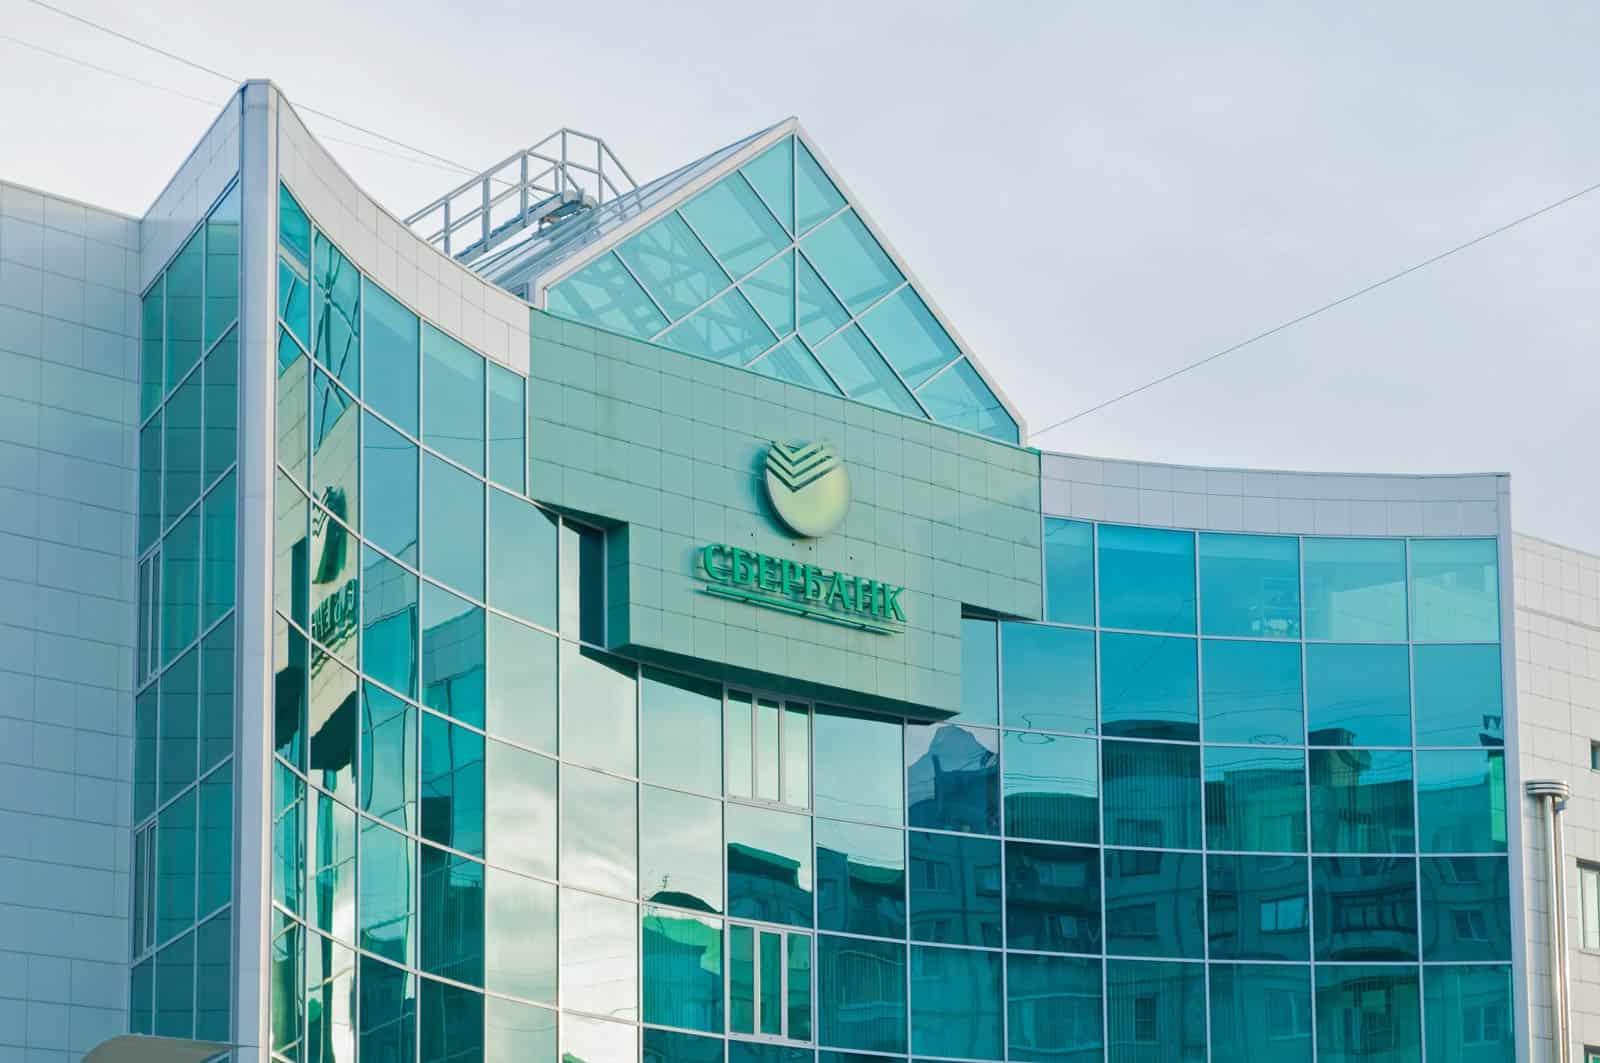 Sberbank tečaj